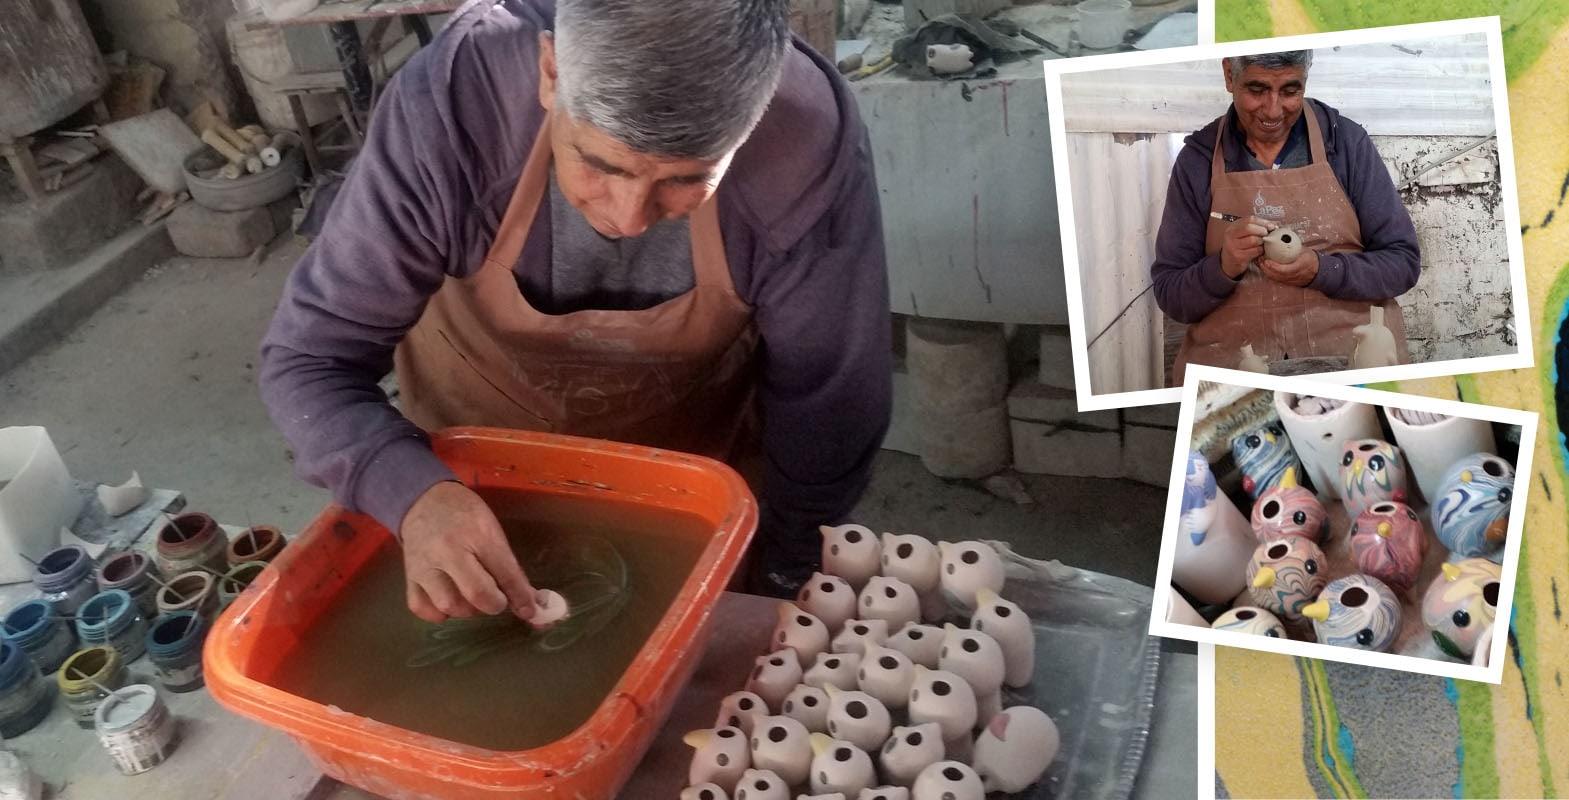 ceramic artist Bernardino